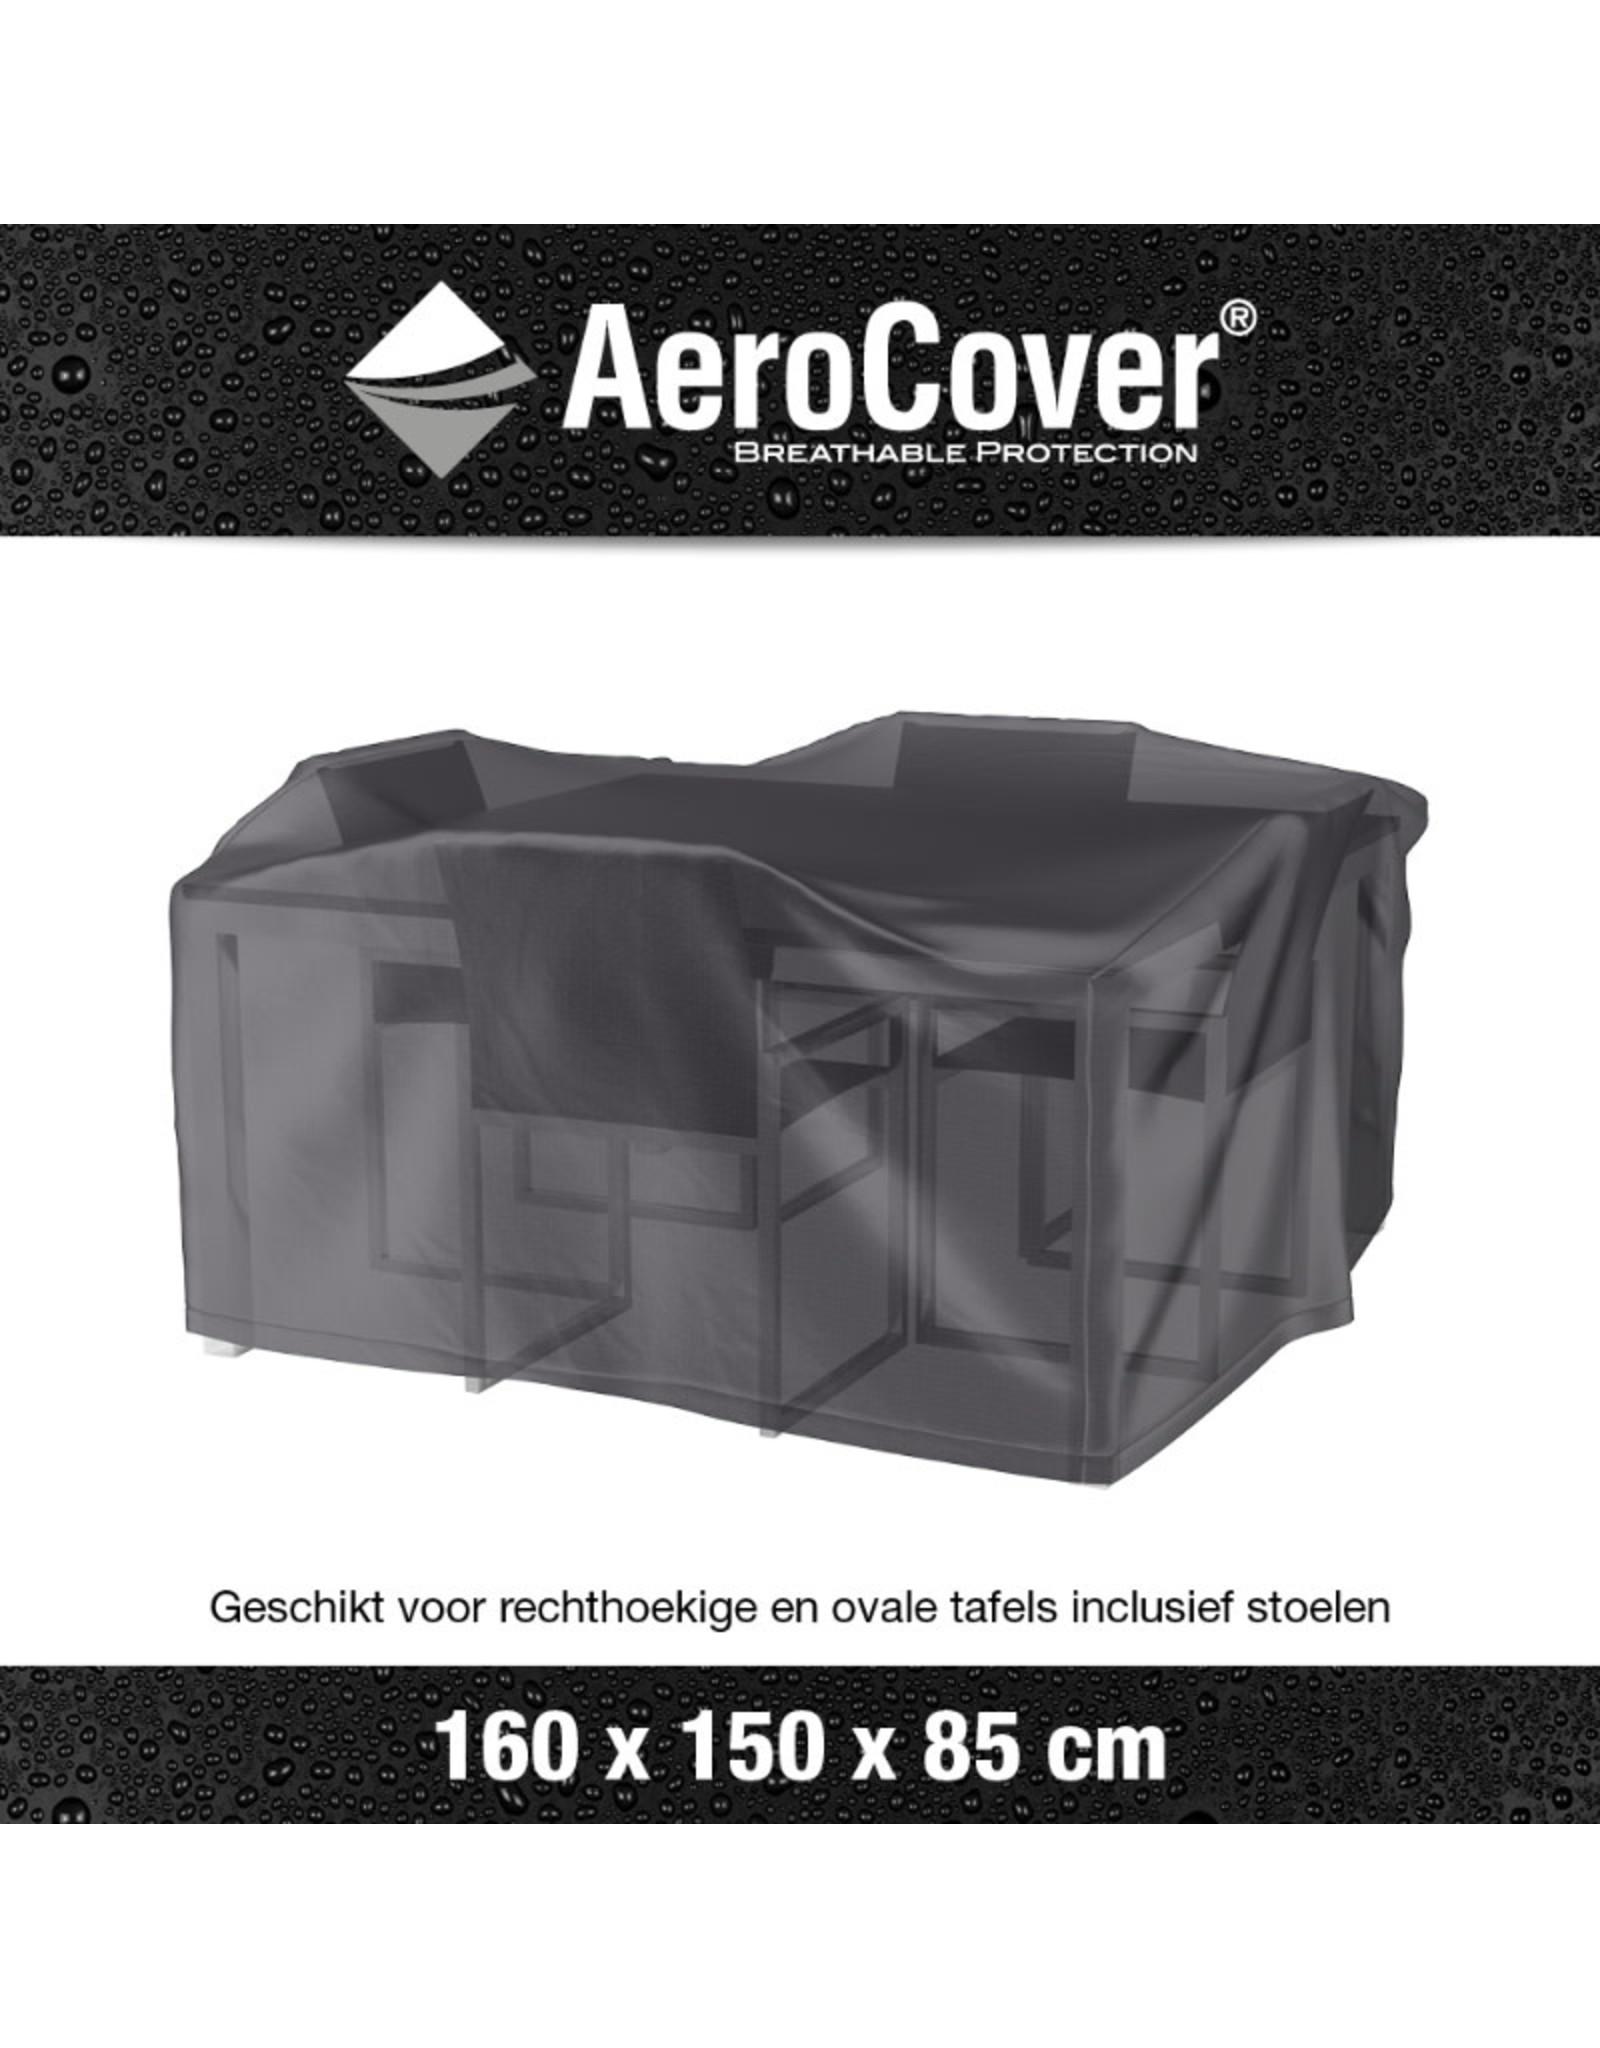 Aerocover AeroCover Tuinsethoes 160x150xH85